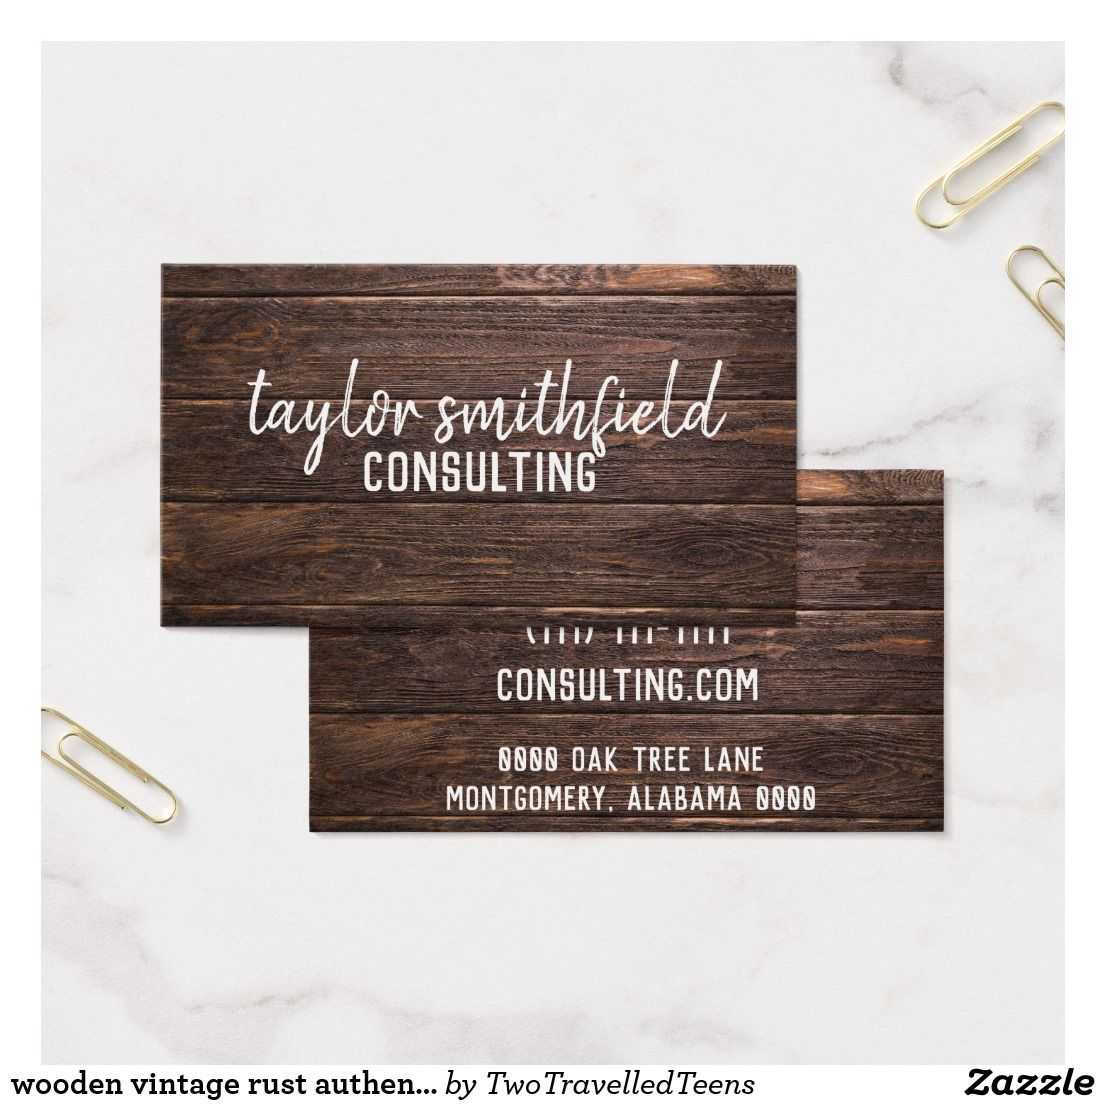 Wooden Vintage Business Card Zazzle Com Vintage Business Cards Trendy Business Cards Customizable Business Cards Templates